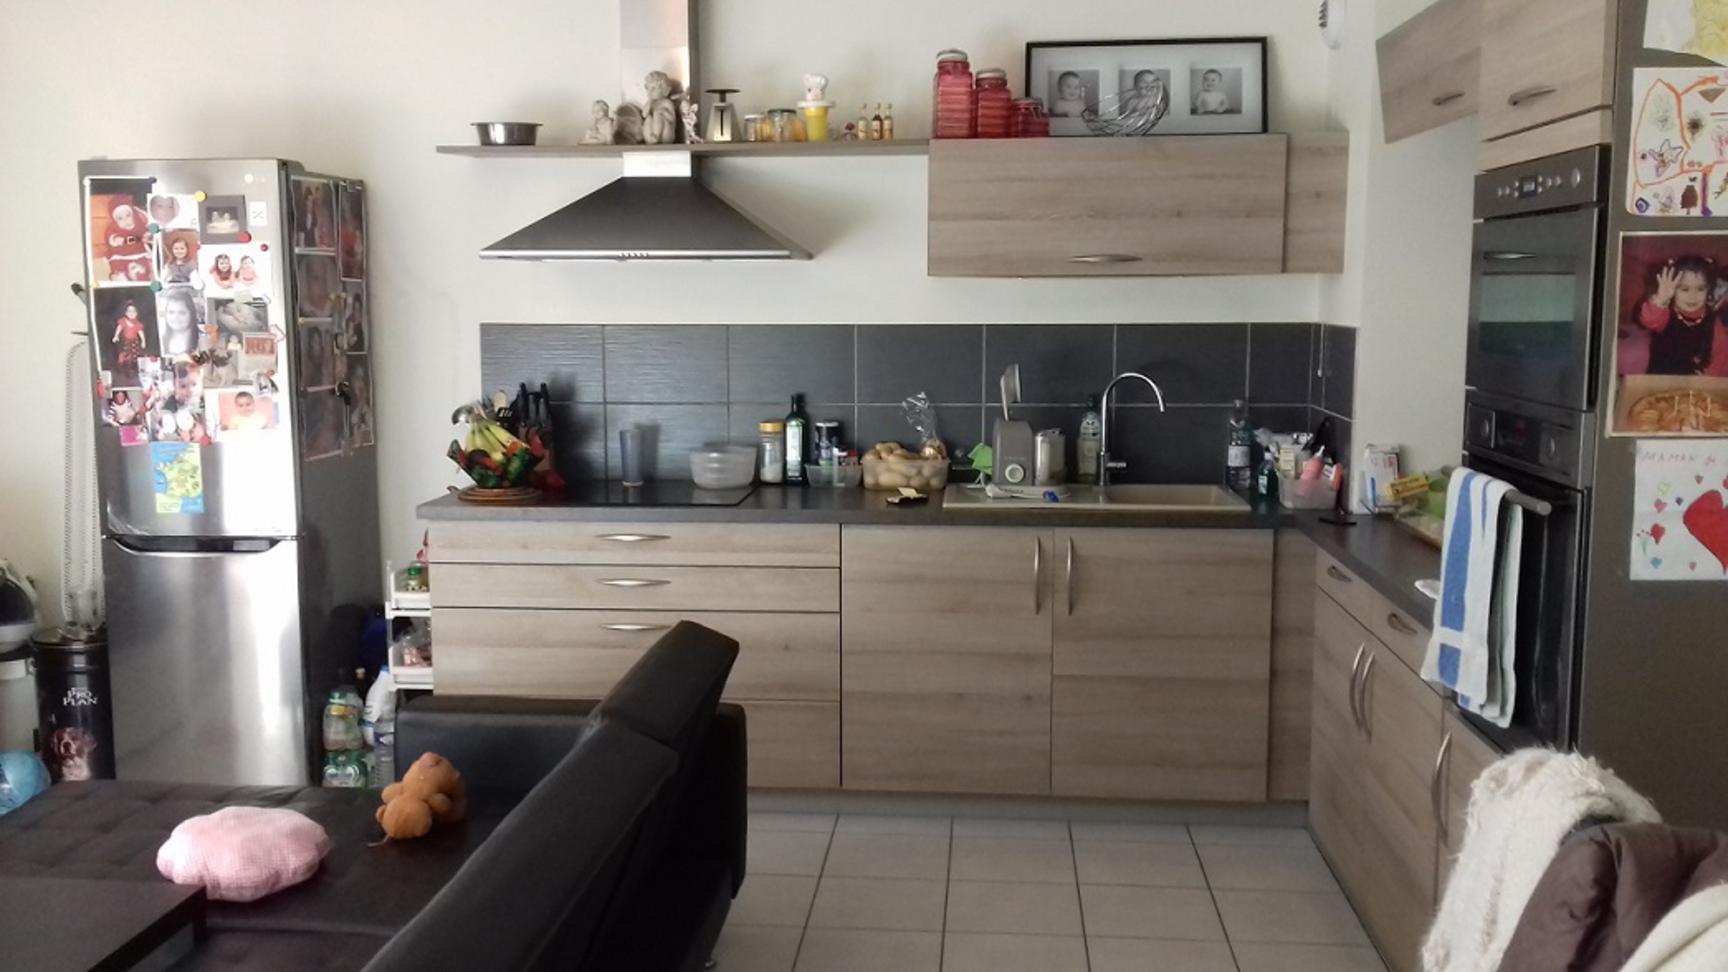 Annonce vente appartement la verpilli re 38290 59 m for Annonce vente appartement